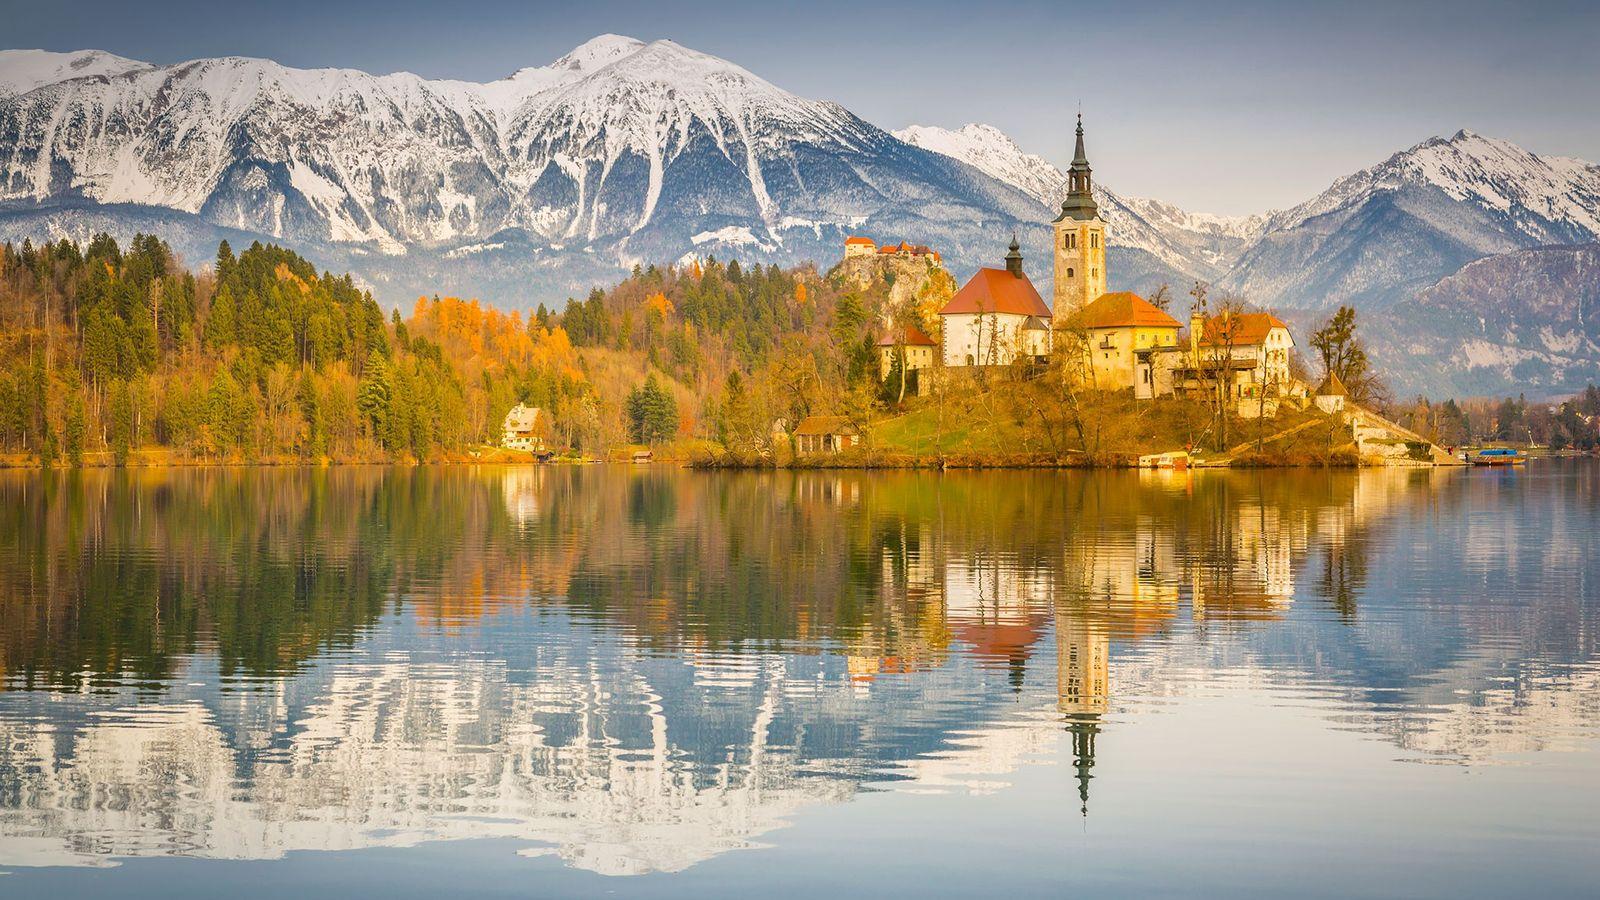 Church of the Assumption, Slovenia